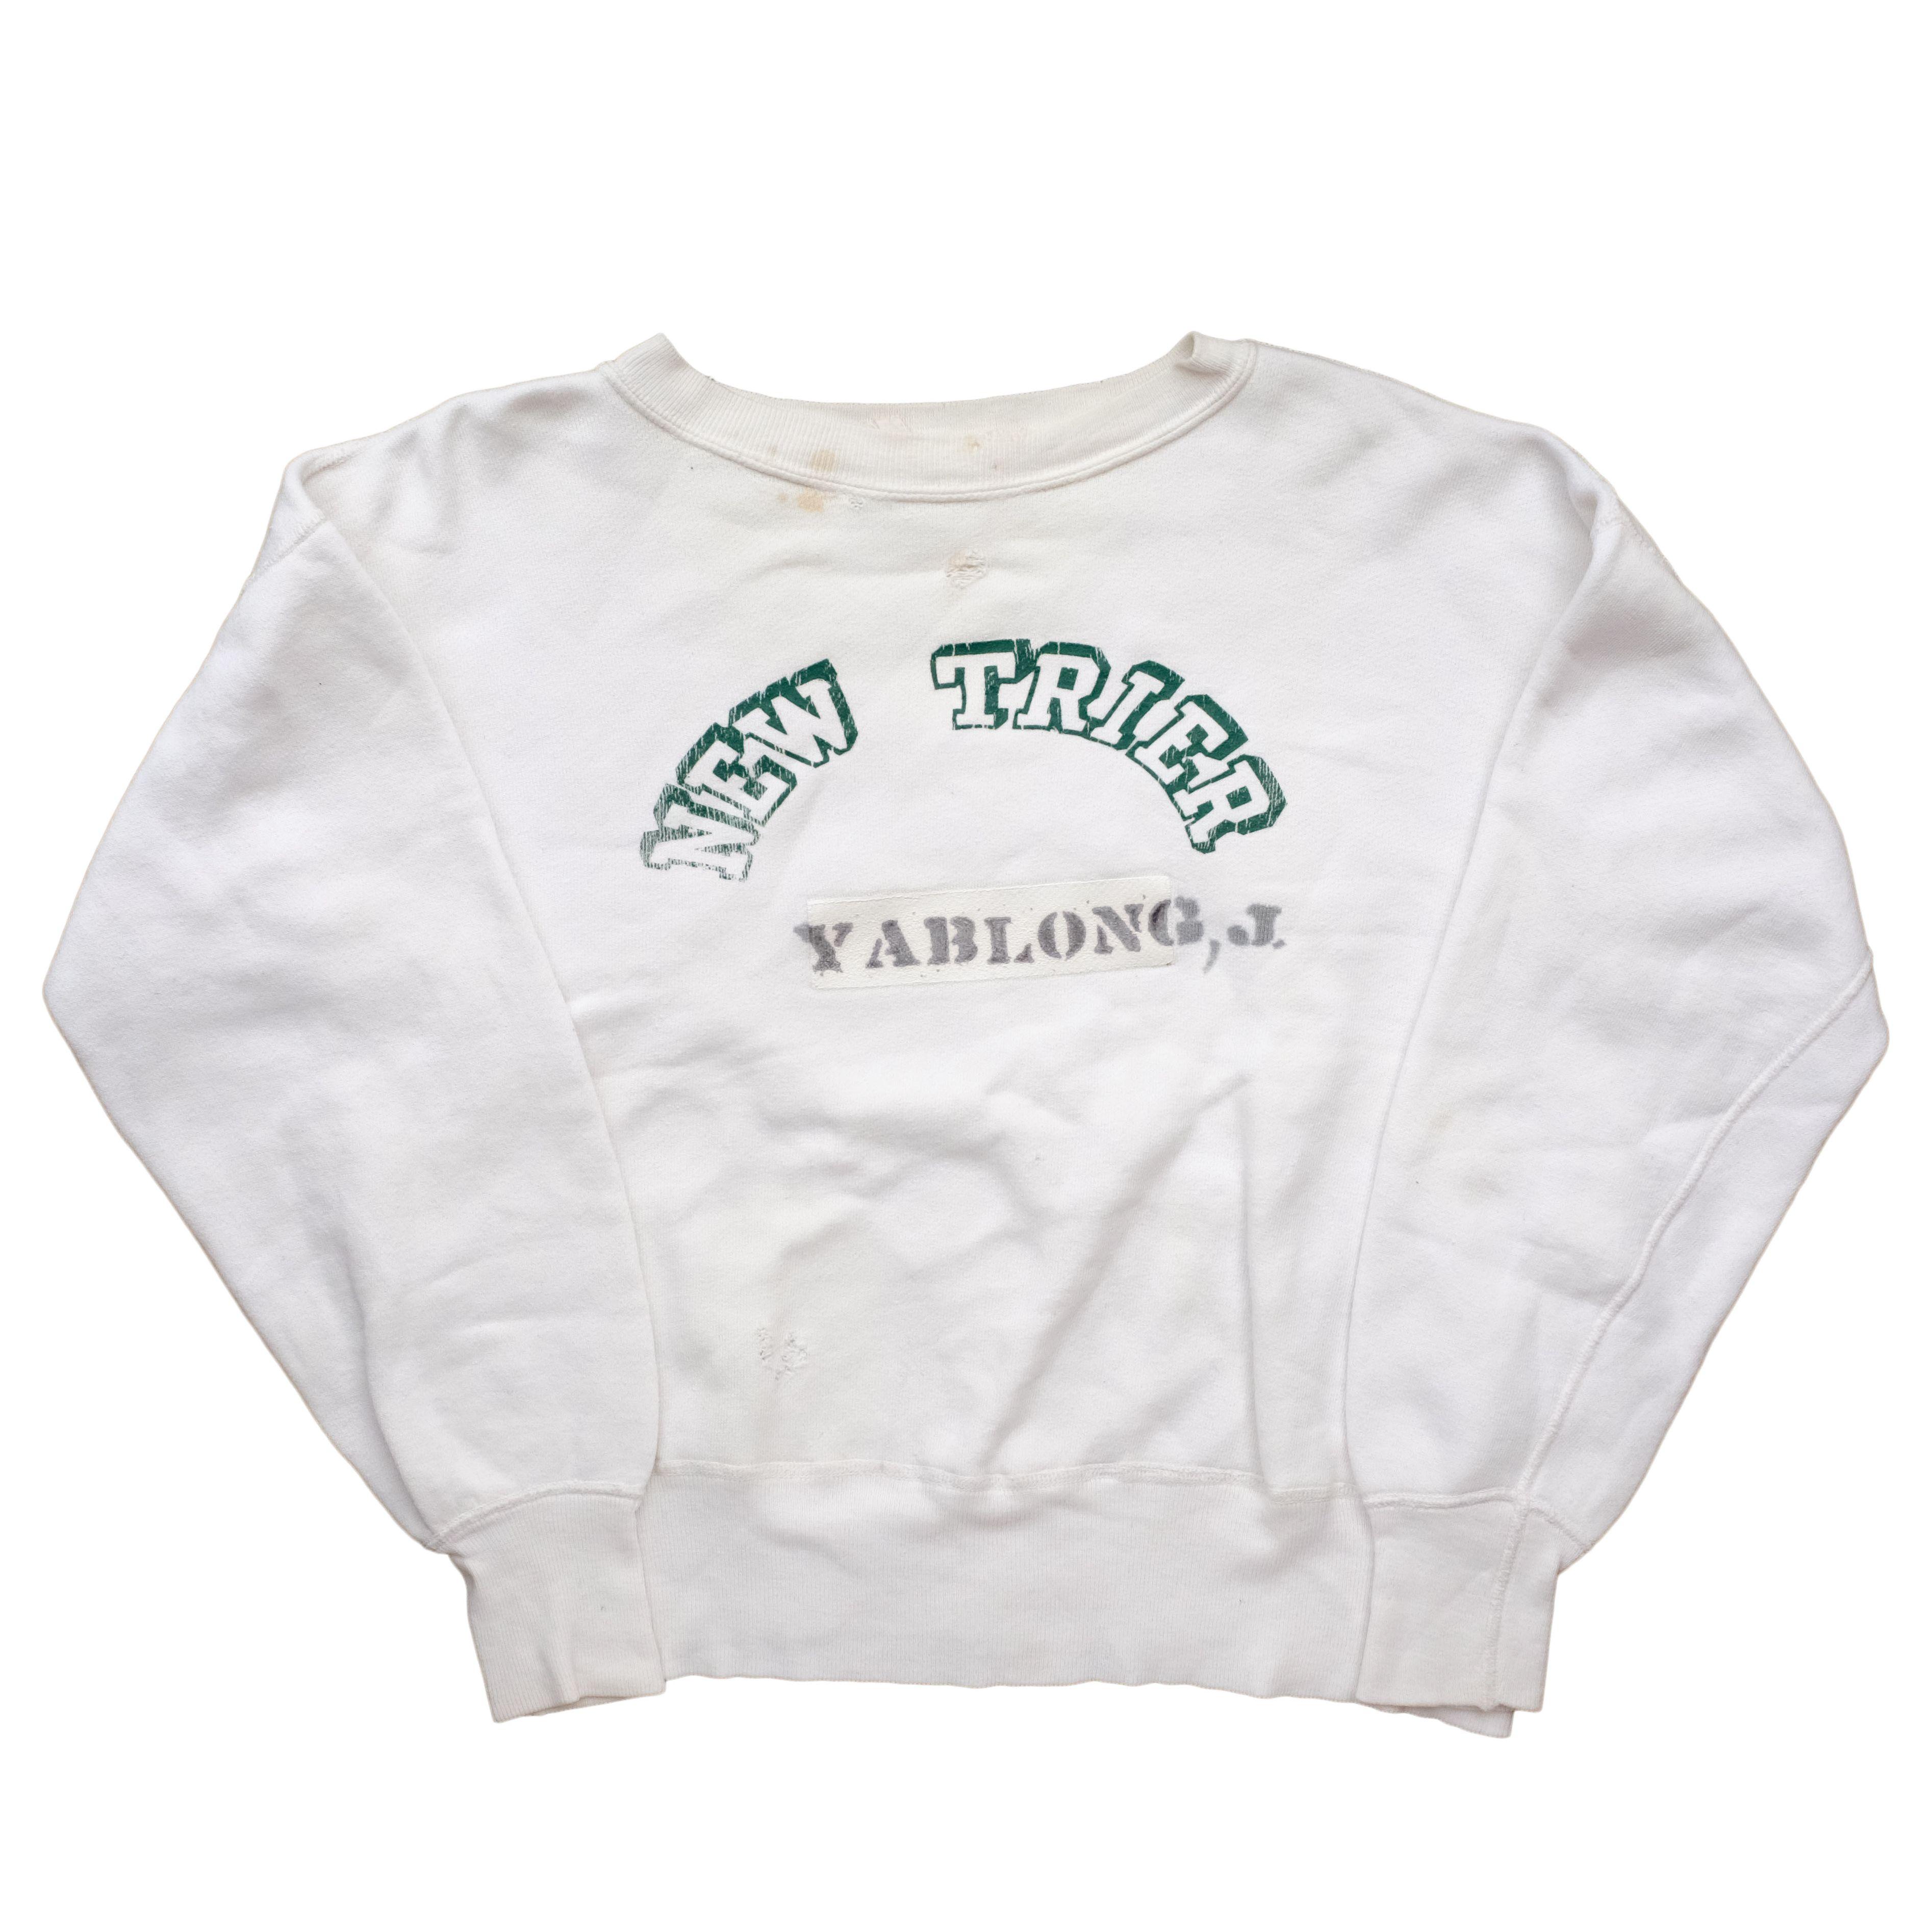 Vintage 1950 S Champion Running Man Sweatshirt Sweatshirts Vintage Sweatshirt Mens Sweatshirts [ 3788 x 3788 Pixel ]